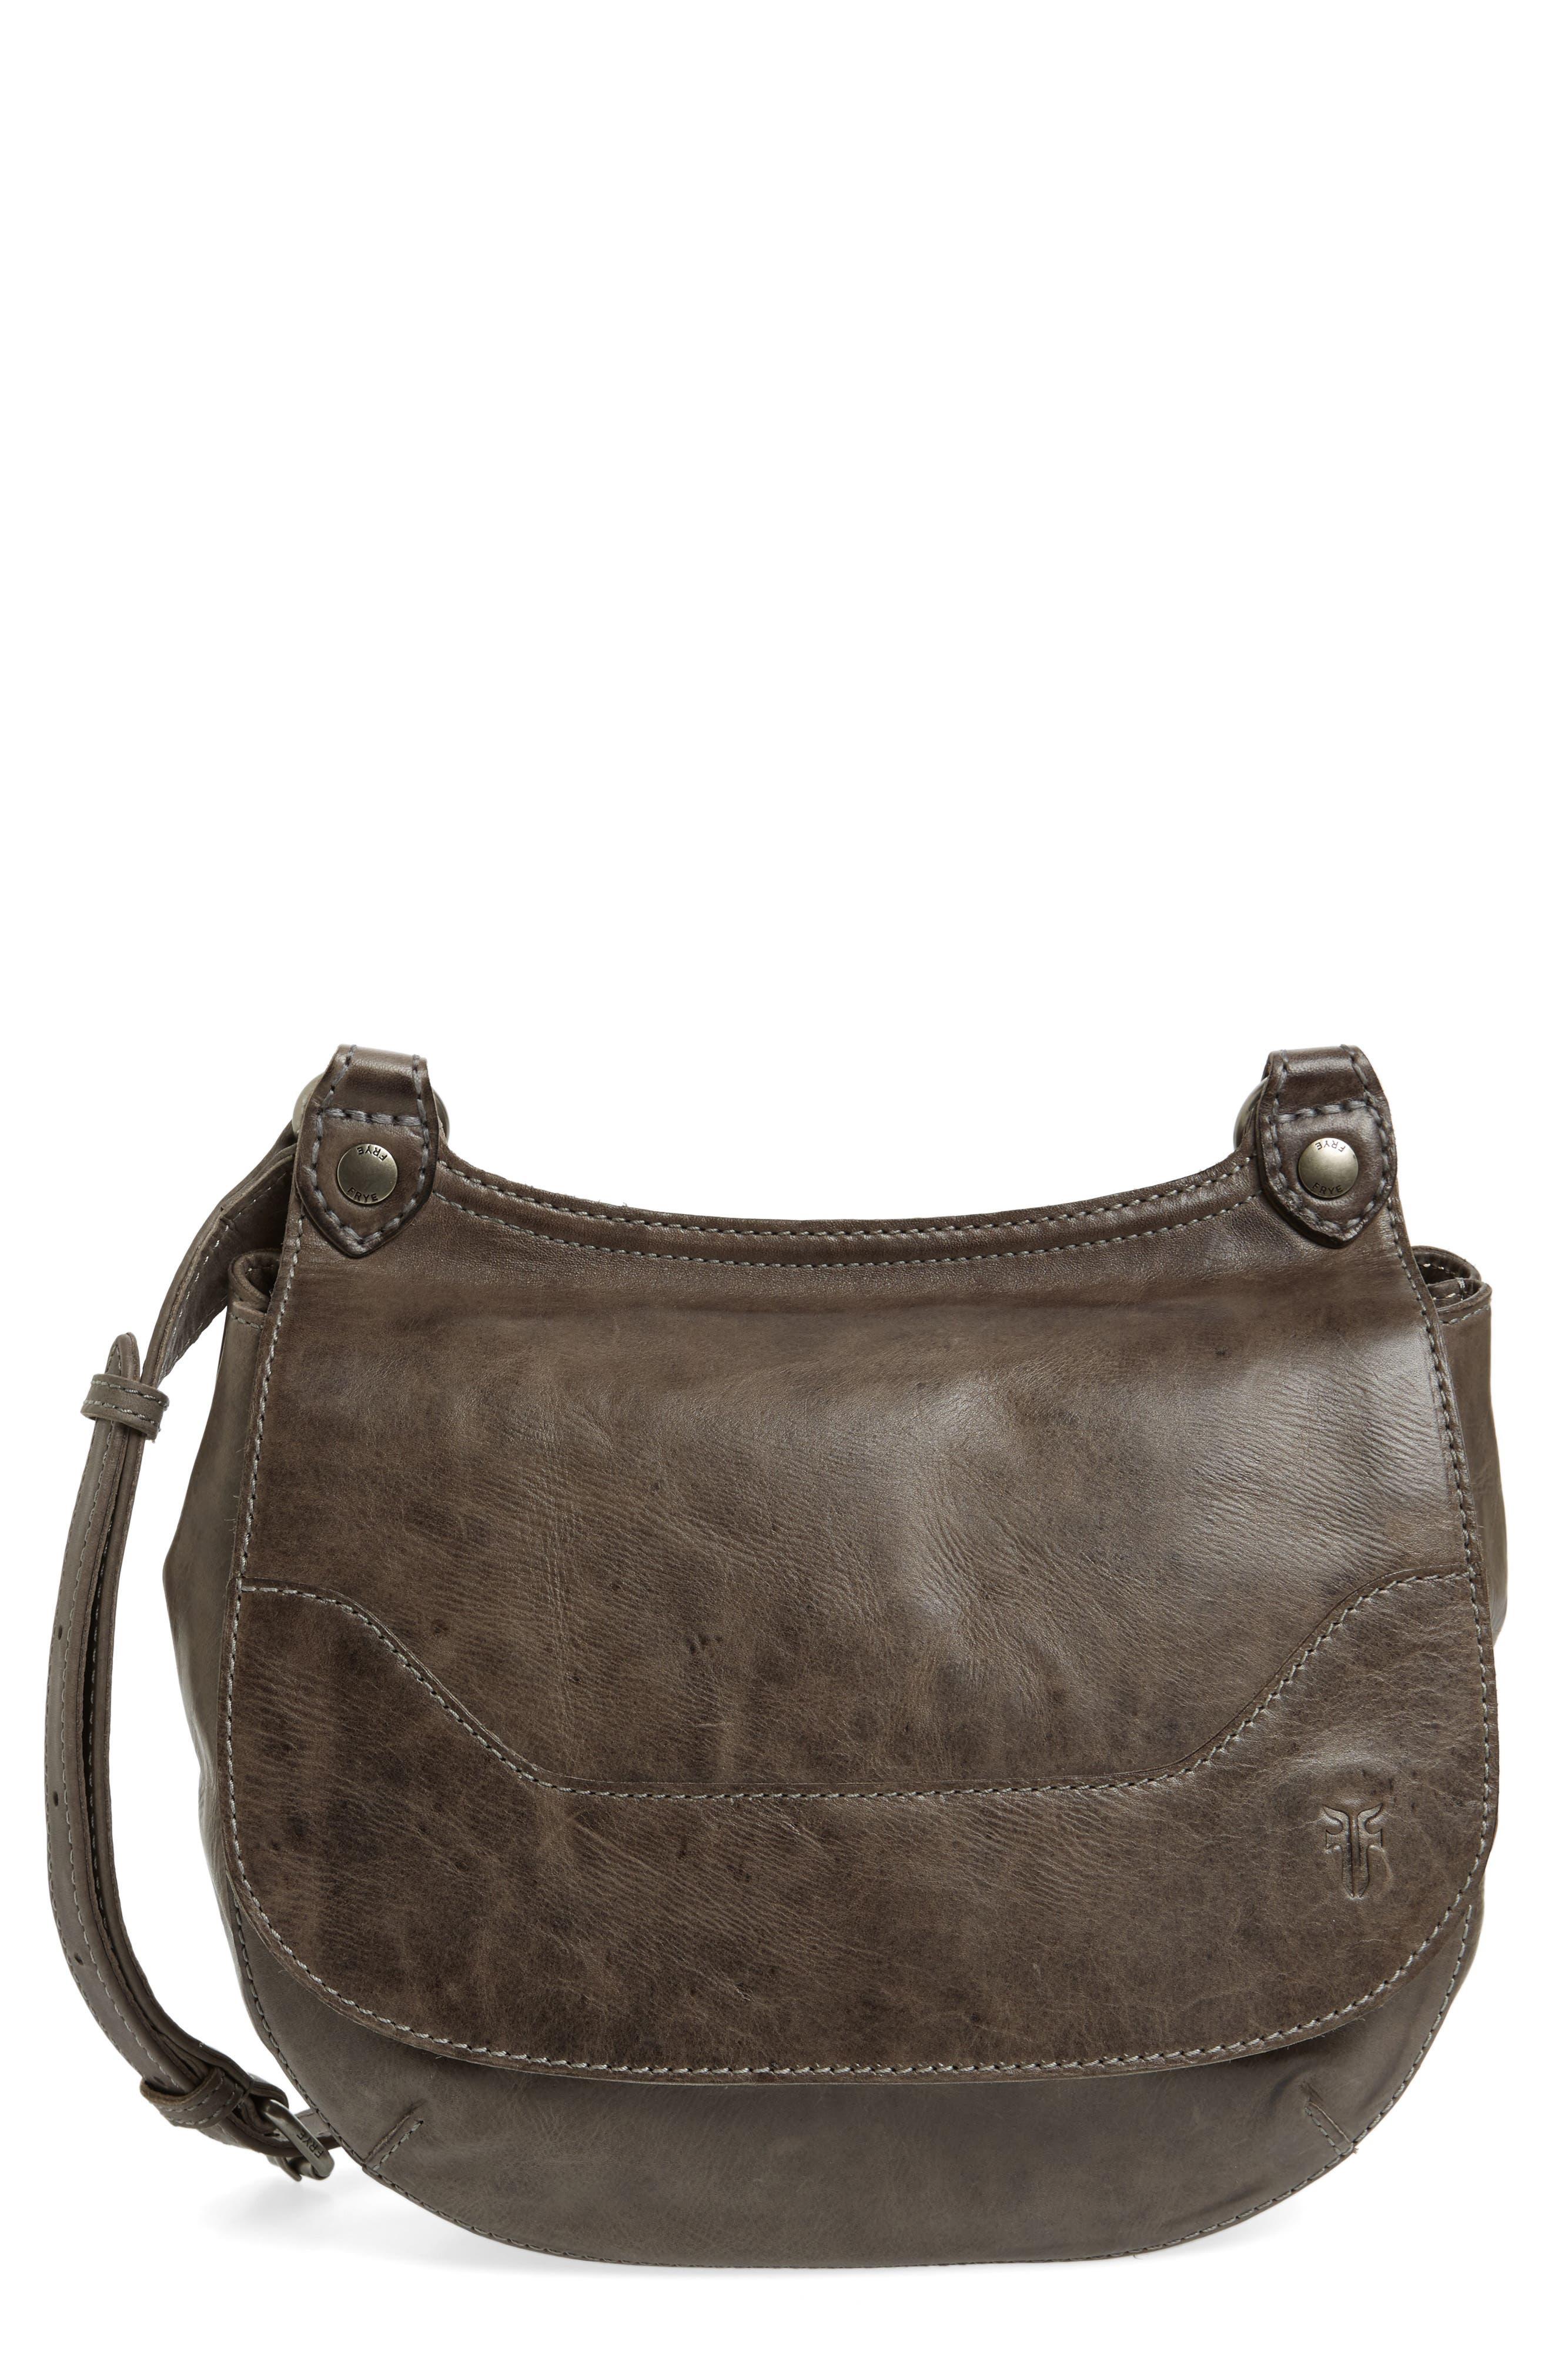 Frye 'Melissa' Leather Crossbody Bag